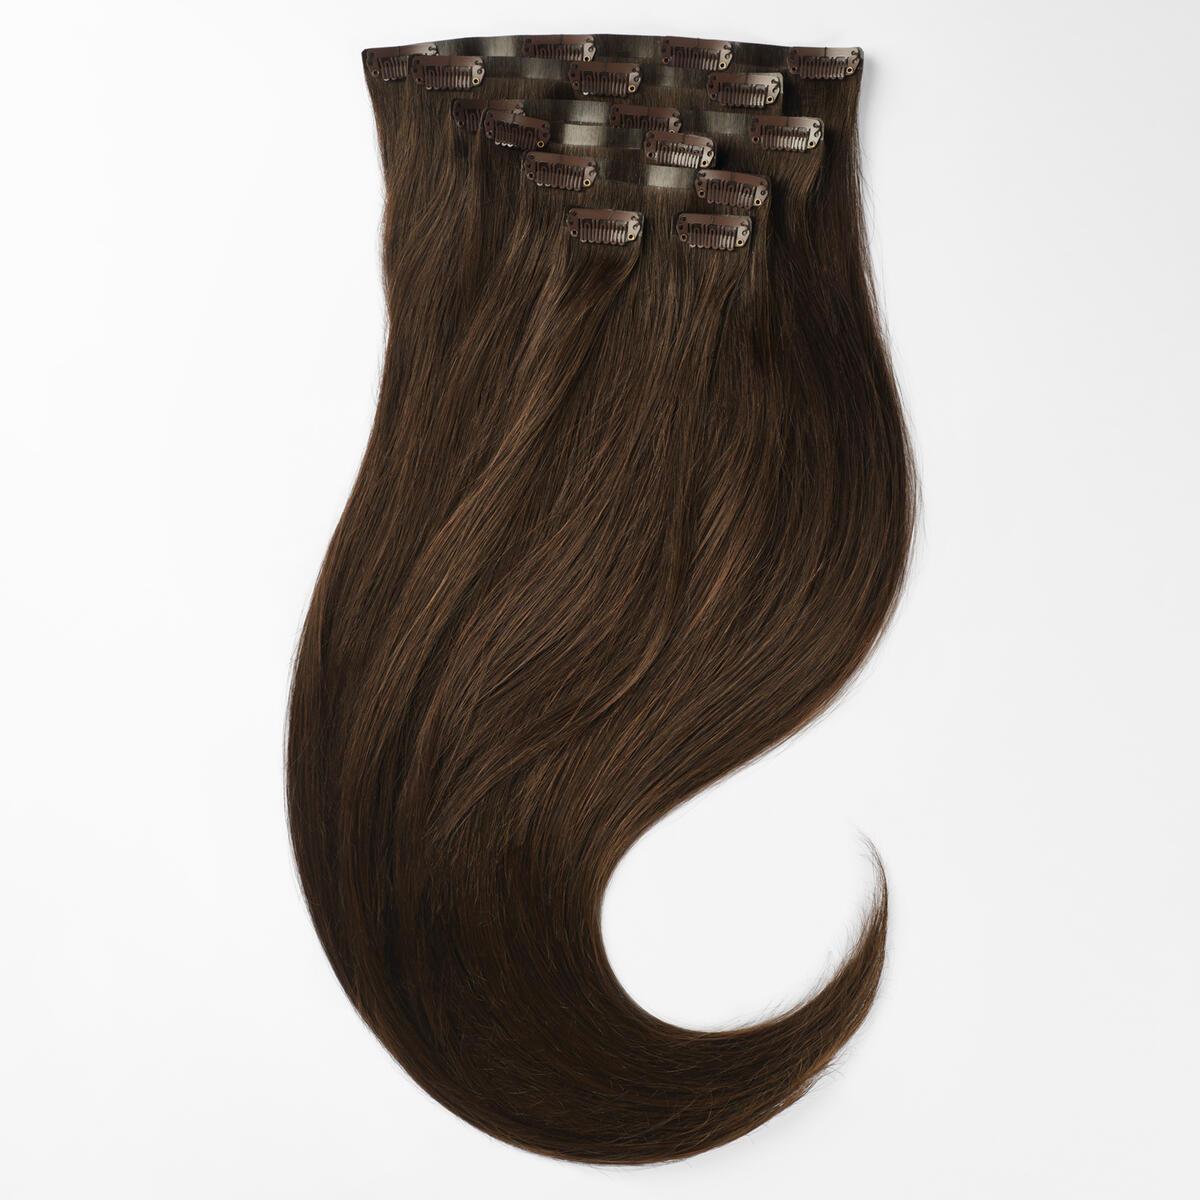 Sleek Clip-on set 7 pieces 2.3 Chocolate Brown 50 cm